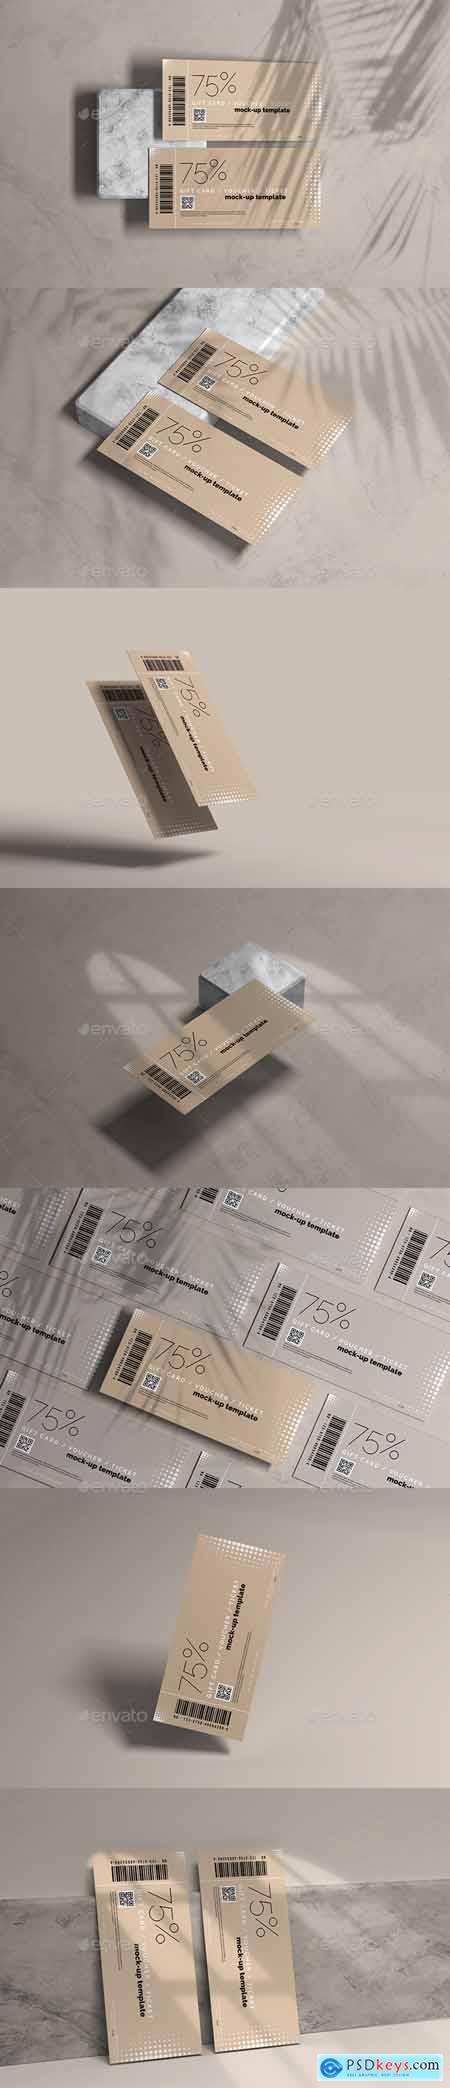 Voucher or Ticket Mockup 29362951